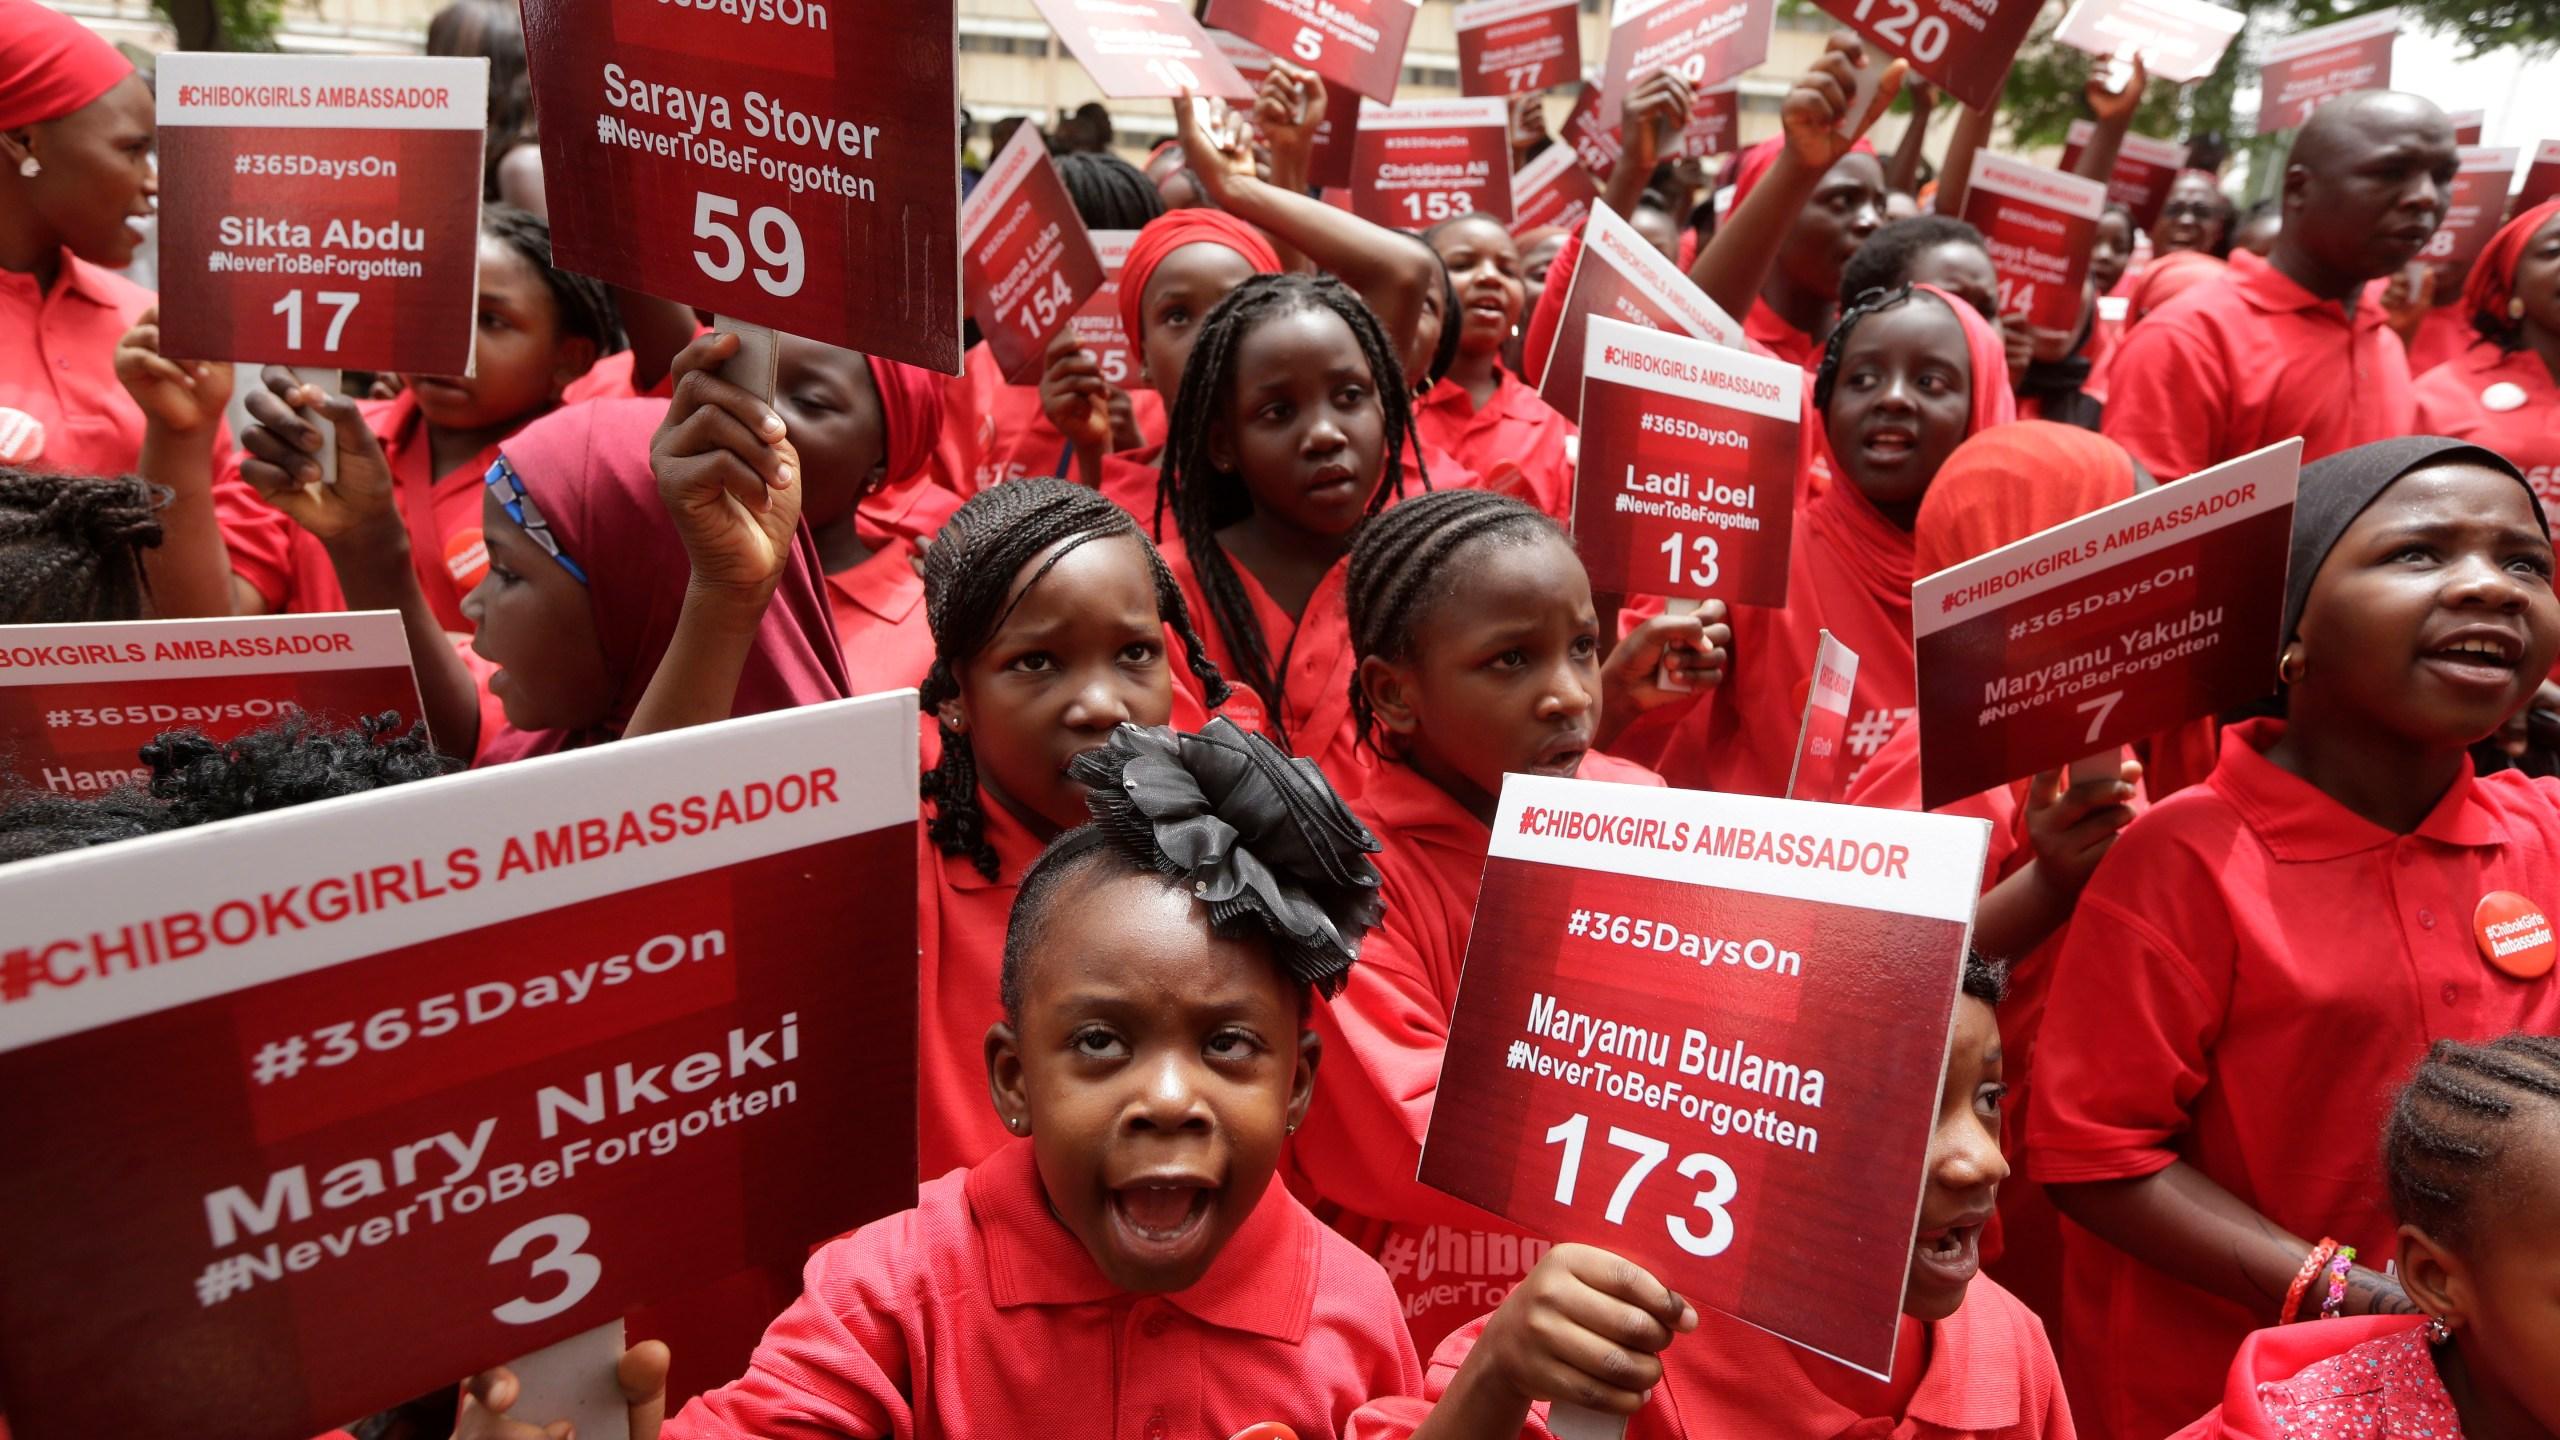 FILE PHOTO _Chibok Ambvassadors_ bearing names of Nigeria Kidnapped Girls Photo by Sunday Alamba, AP Photo_228803